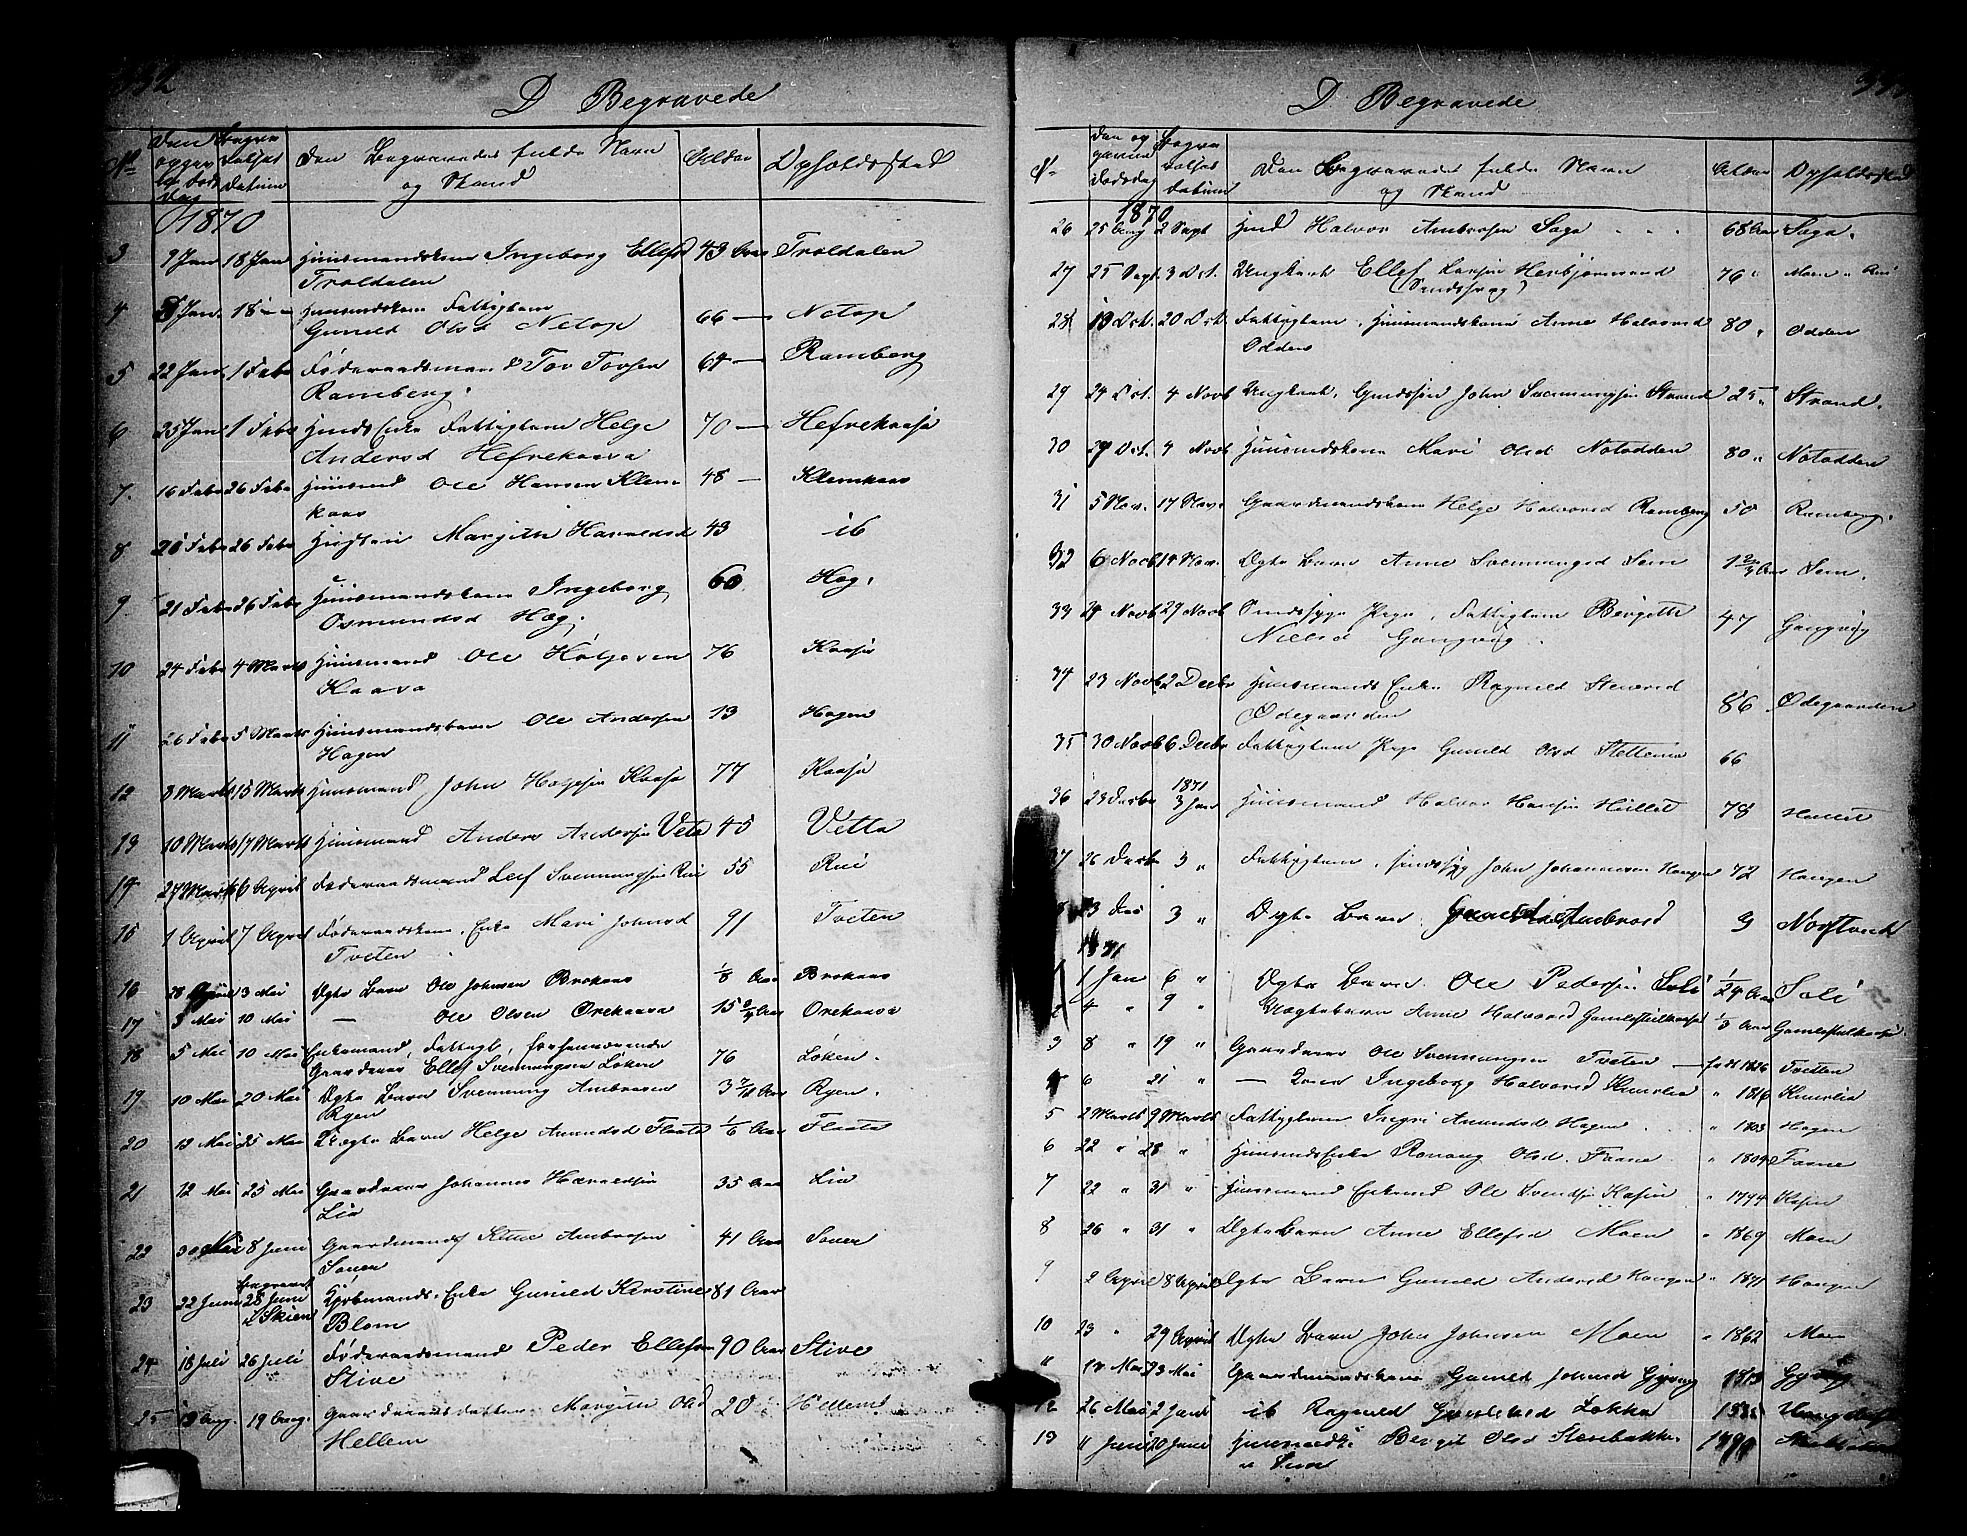 SAKO, Heddal kirkebøker, G/Ga/L0001: Klokkerbok nr. I 1, 1866-1878, s. 332-333